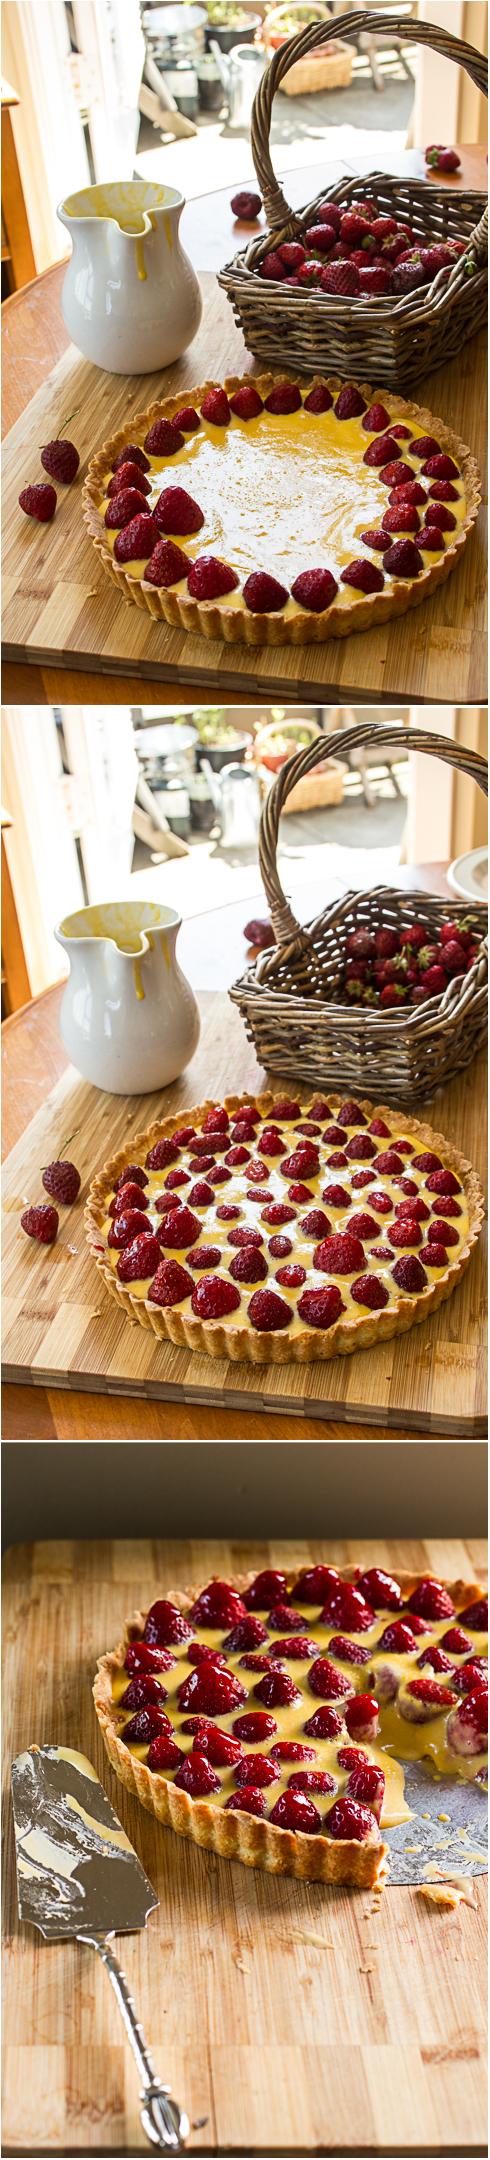 Strawberry Tart Photography © 2012 Helena McMurdo